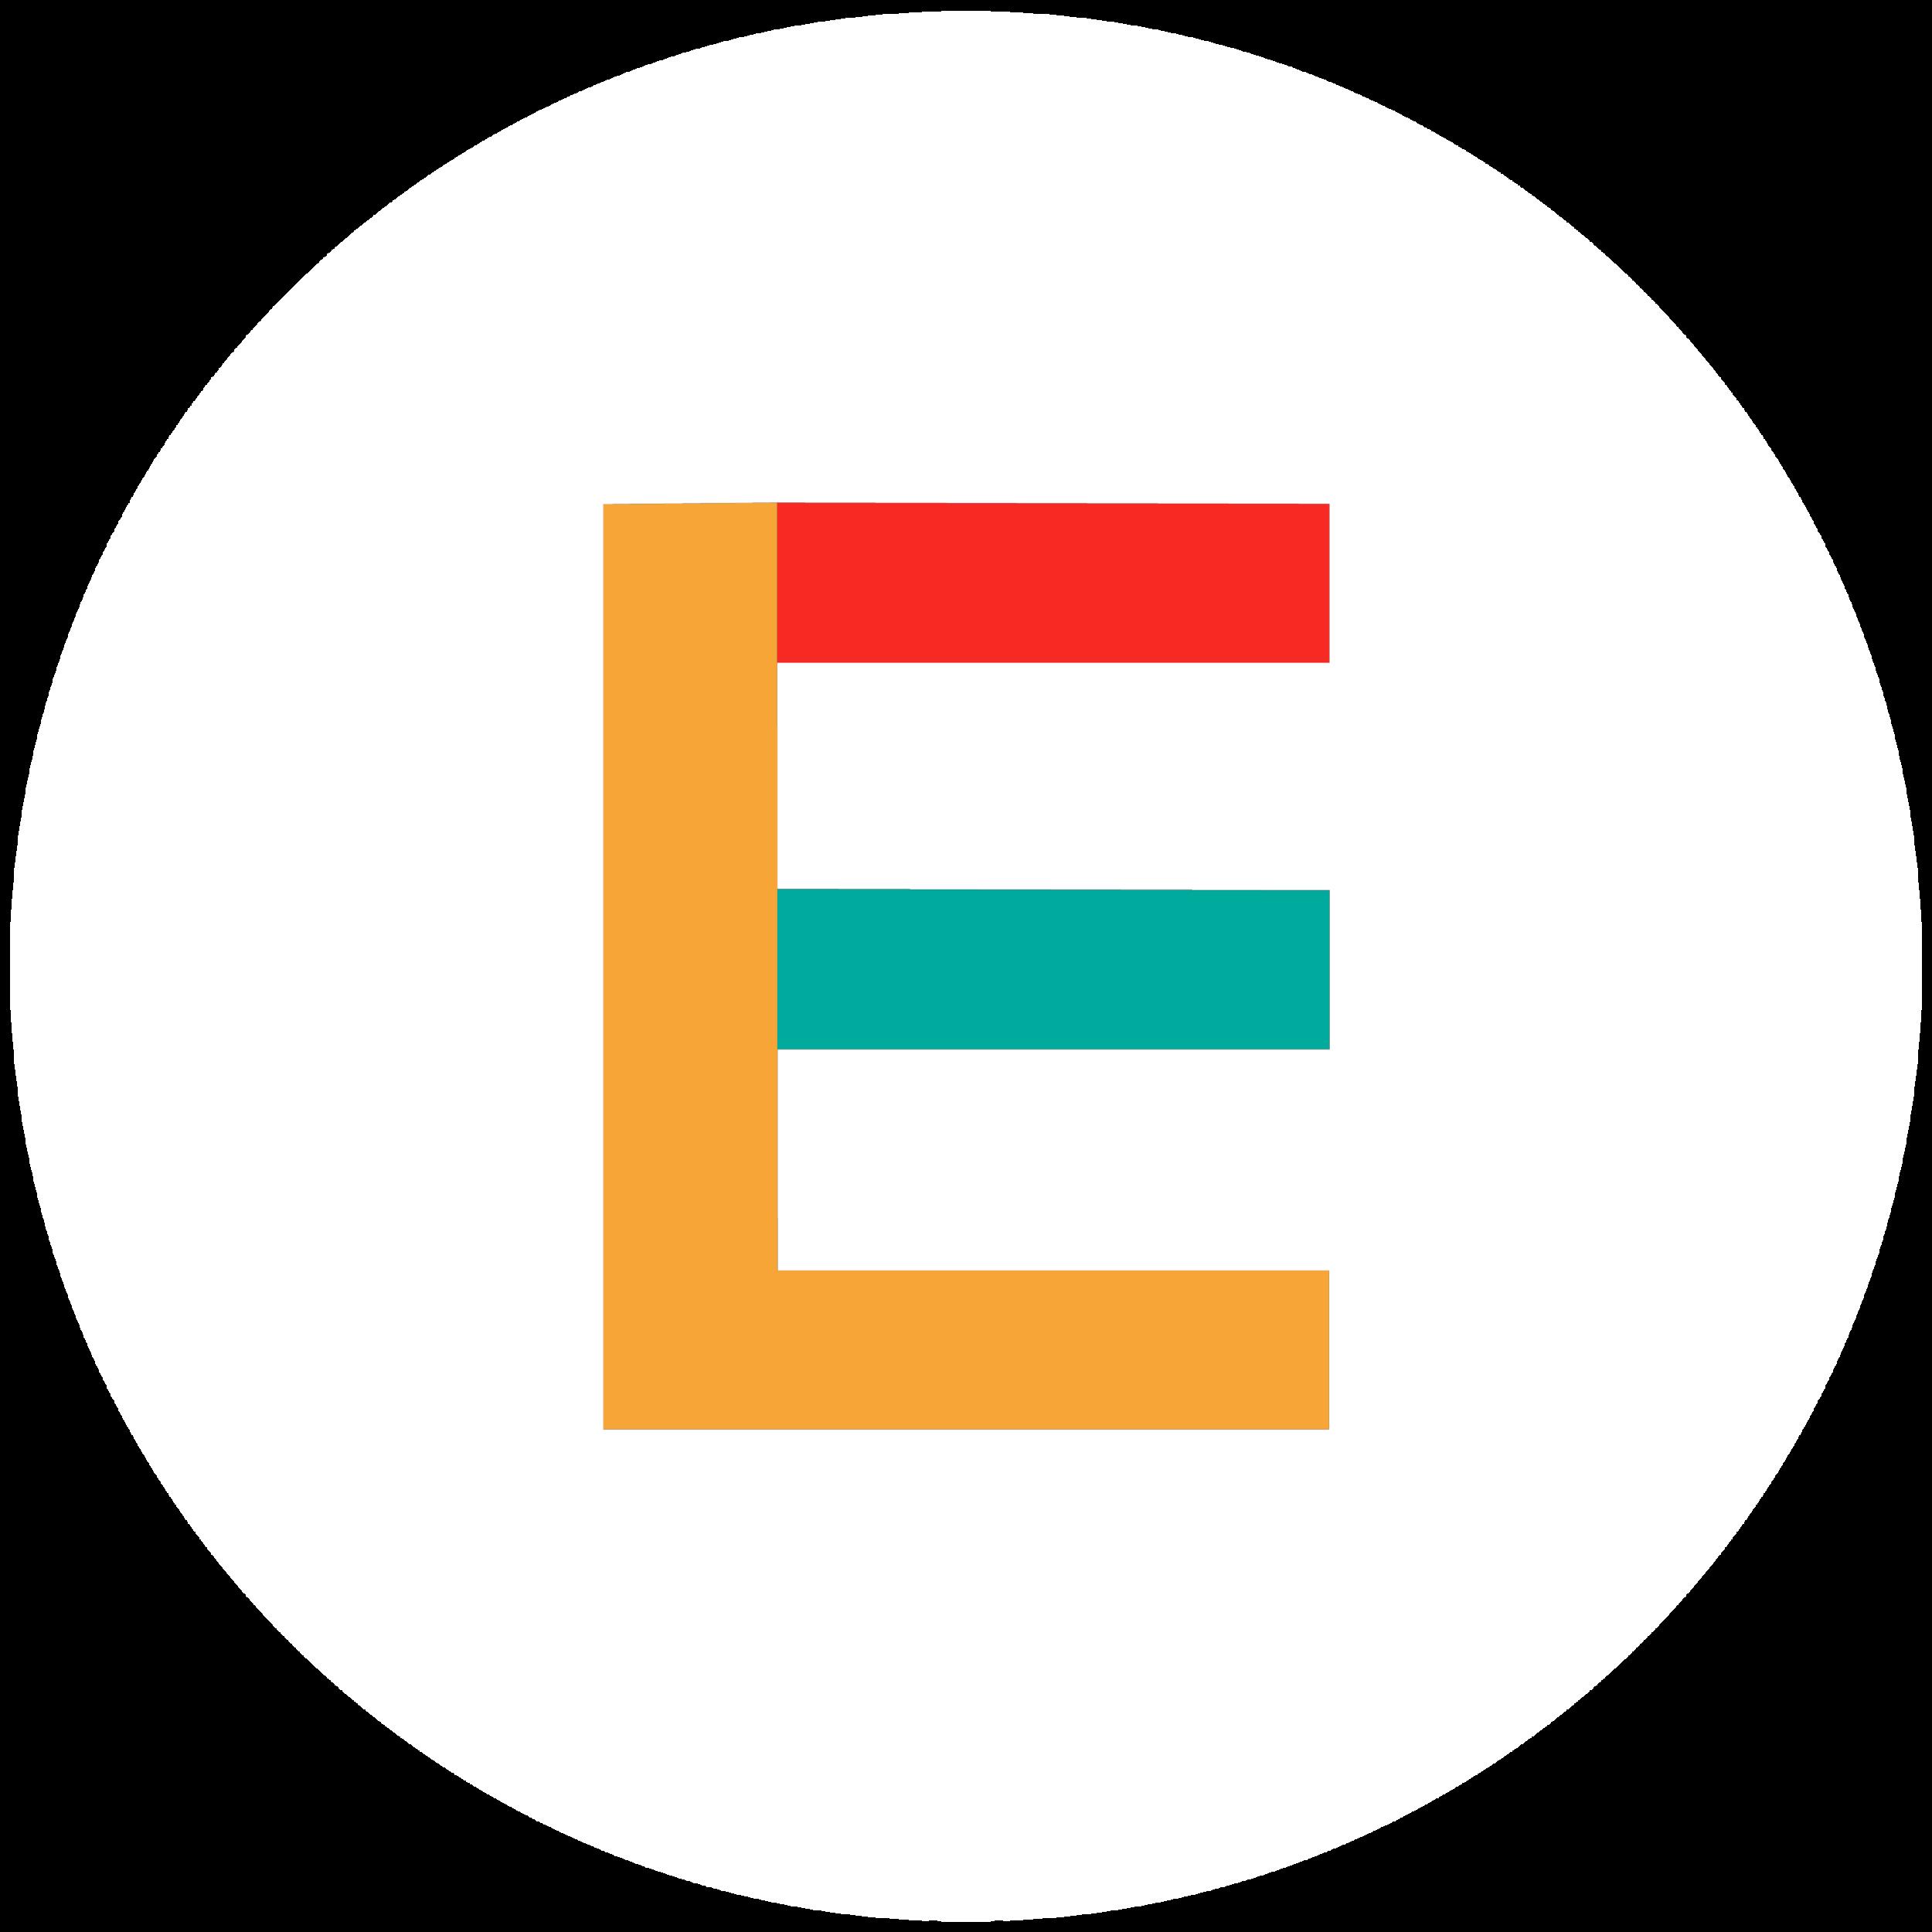 elab_logo_smallwhite.png